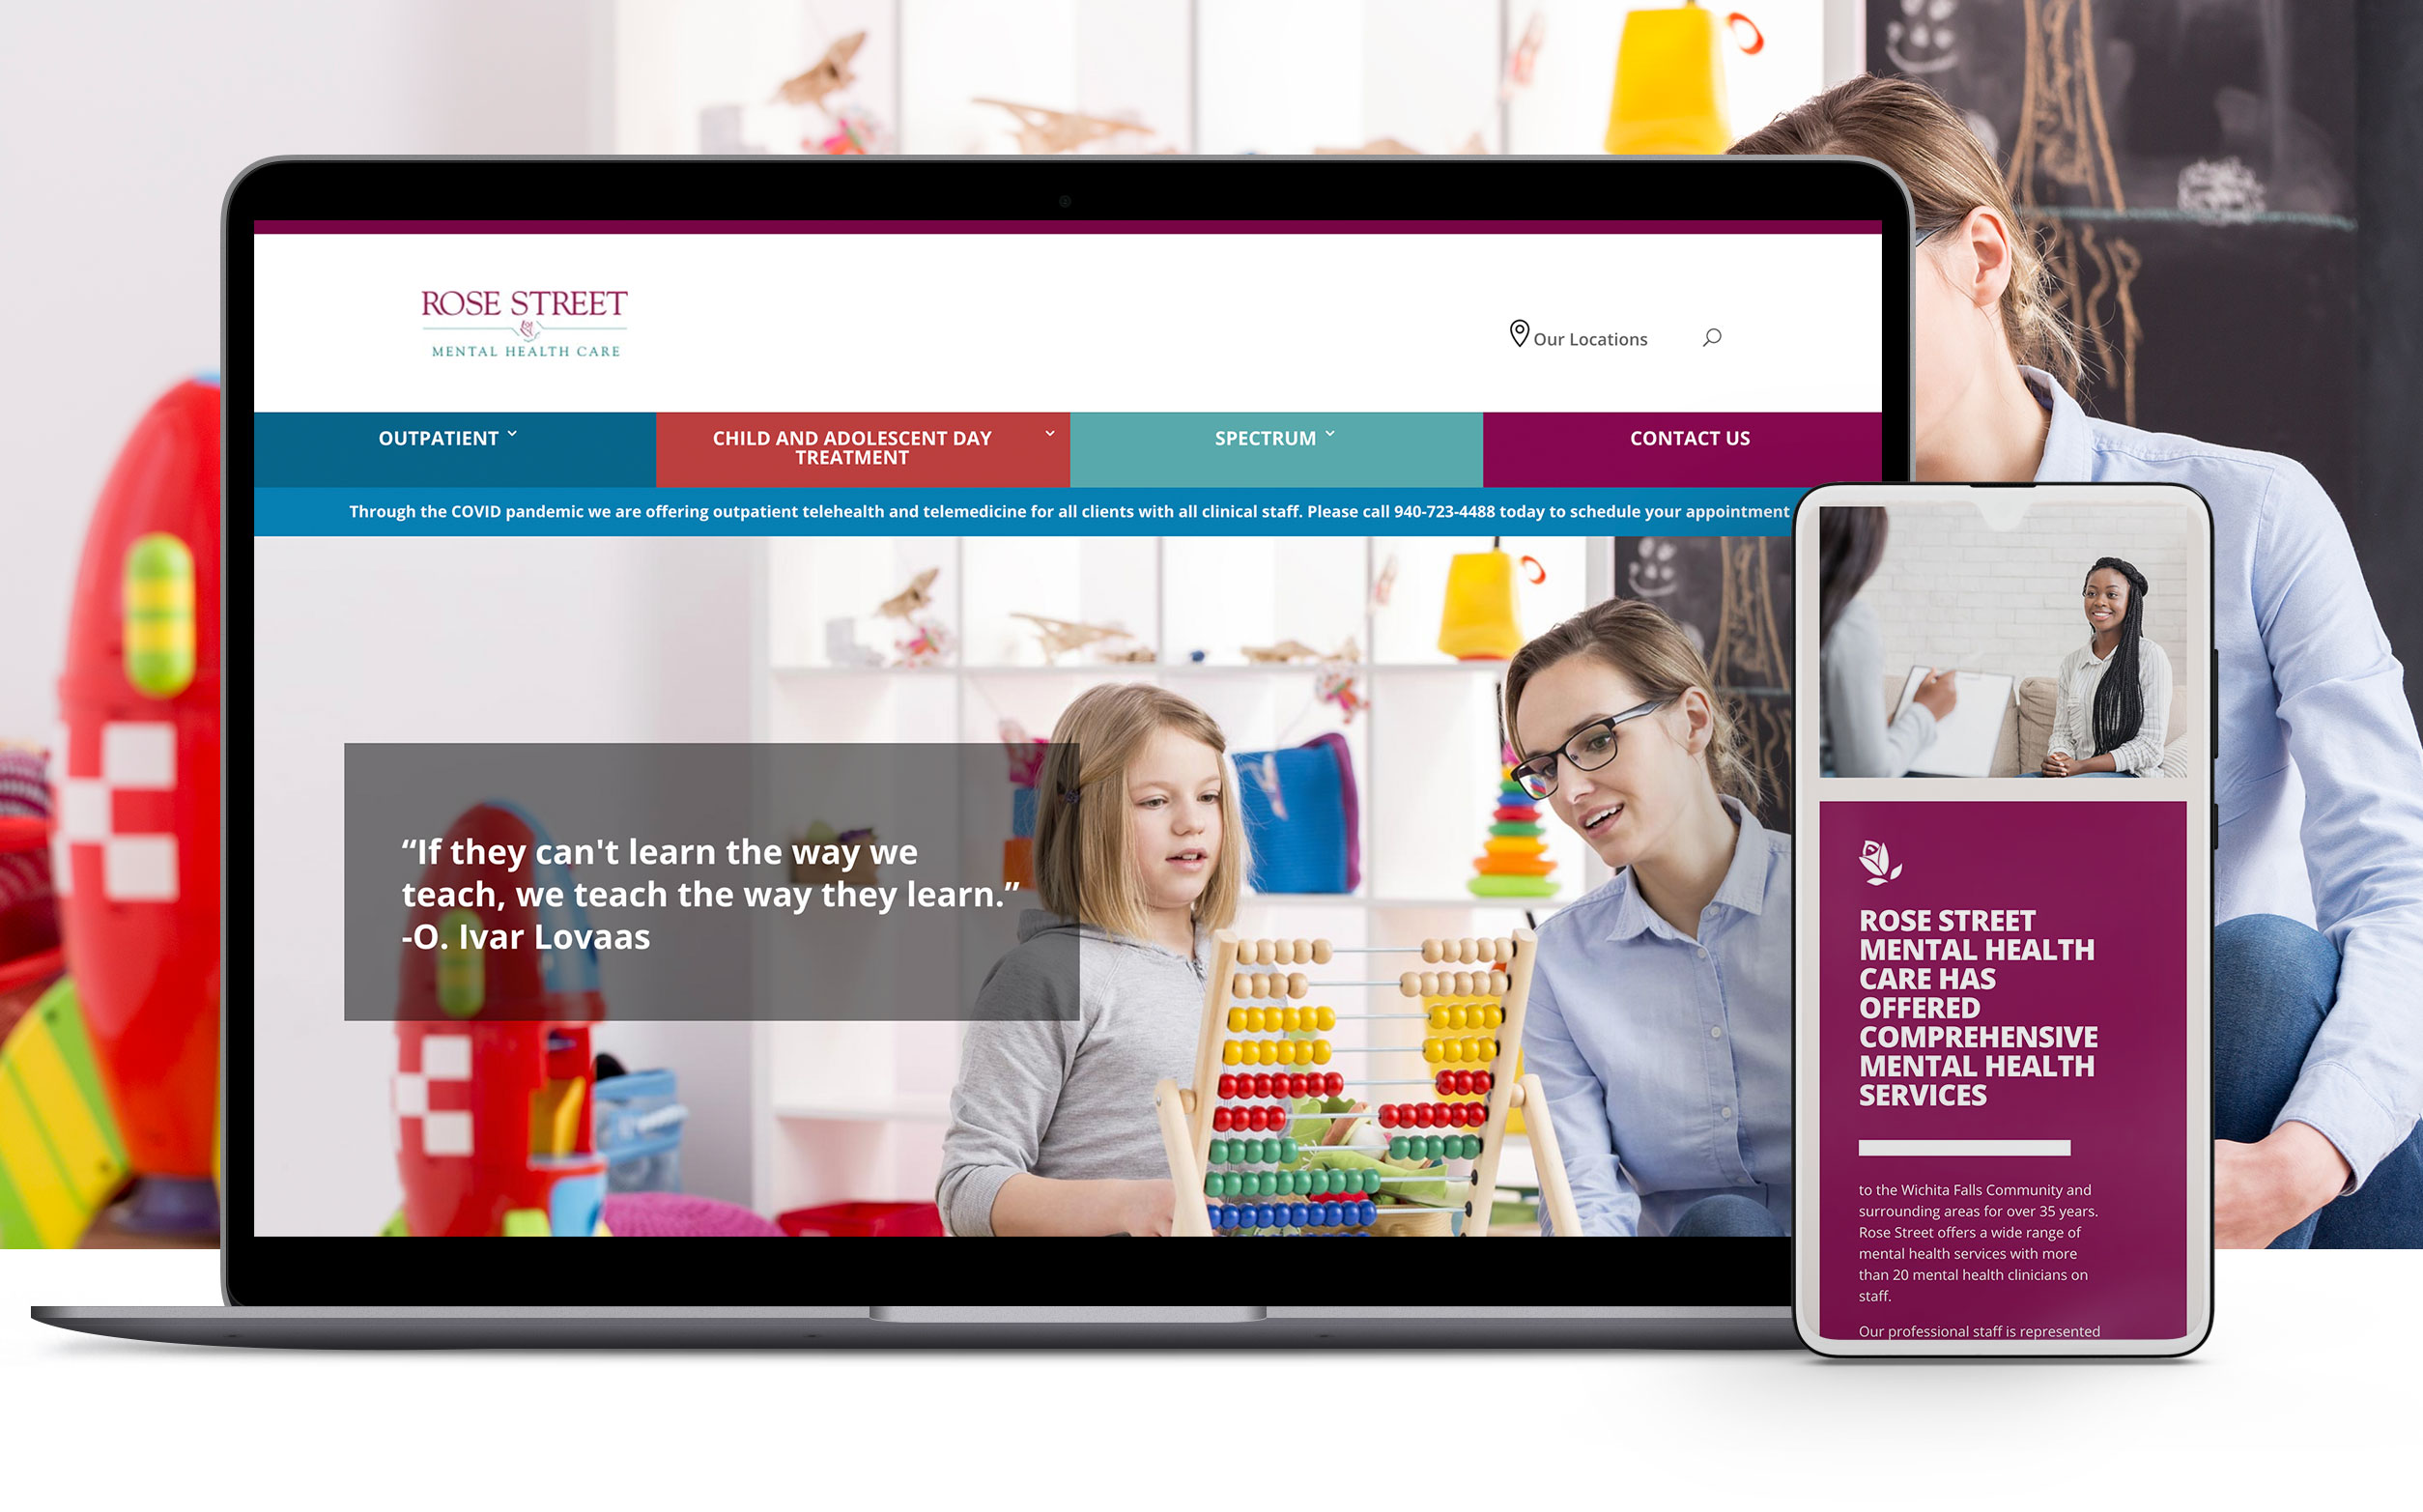 rosestreet website design and development